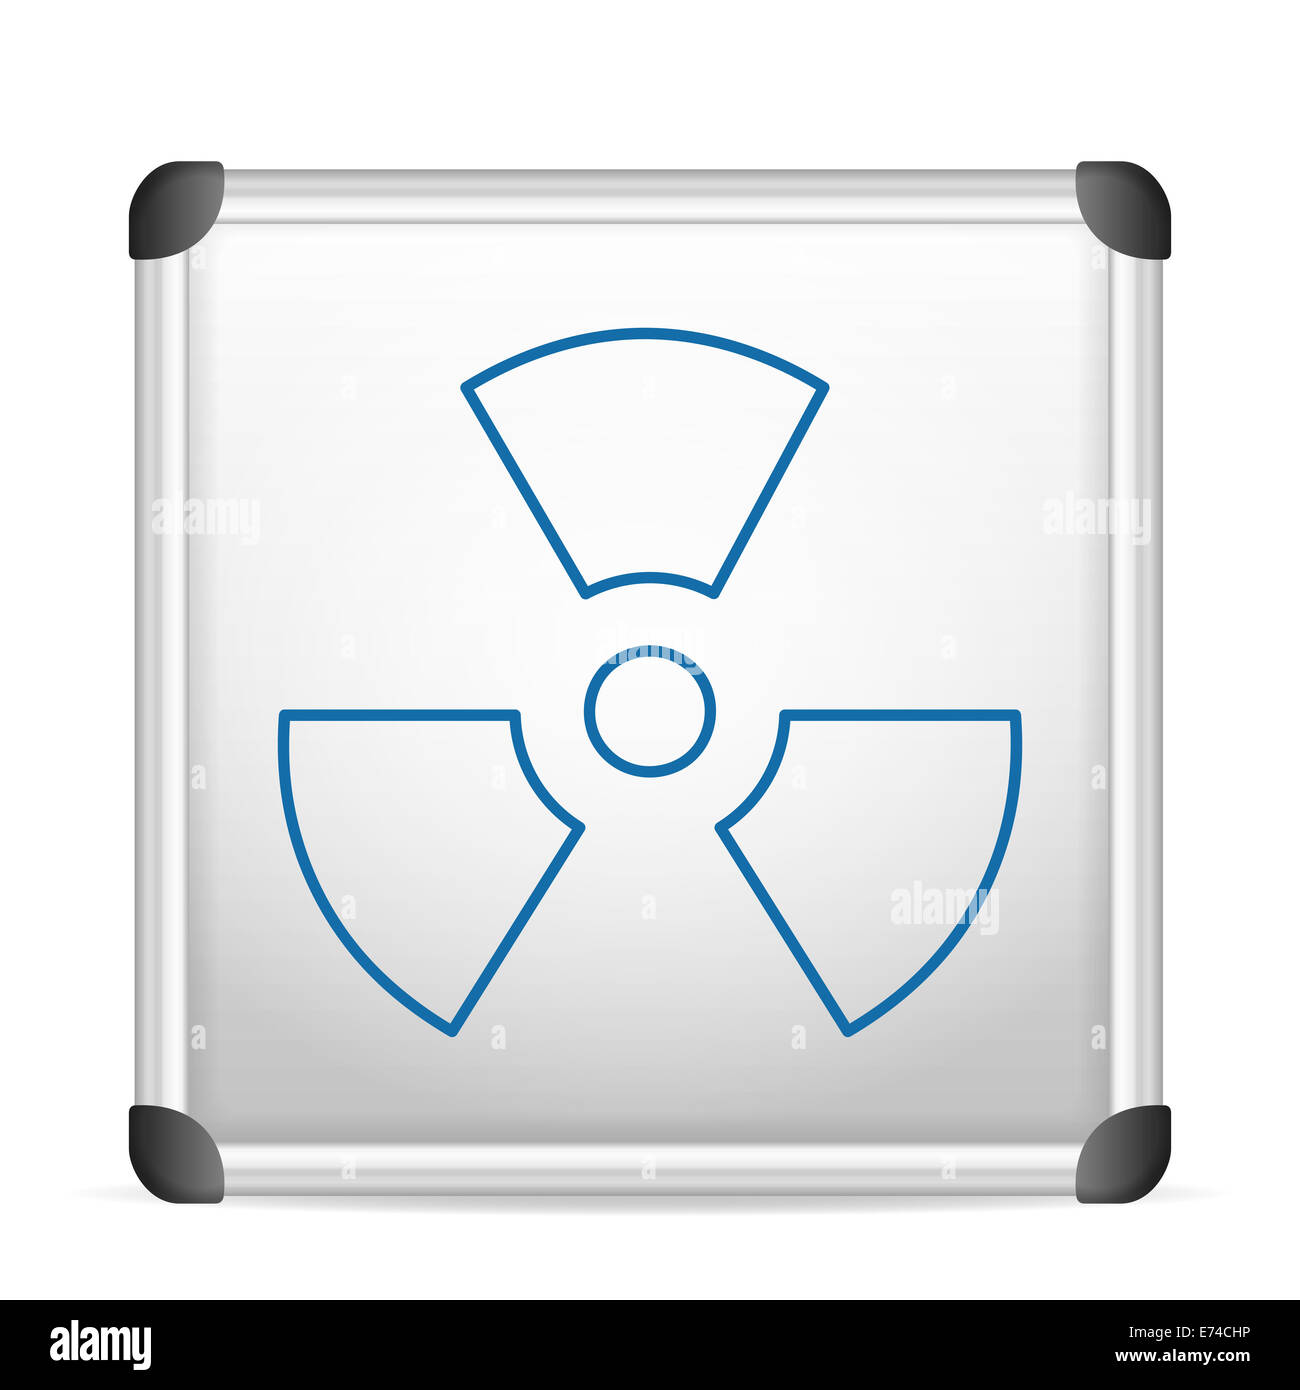 whiteboard radiation on a white background. - Stock Image